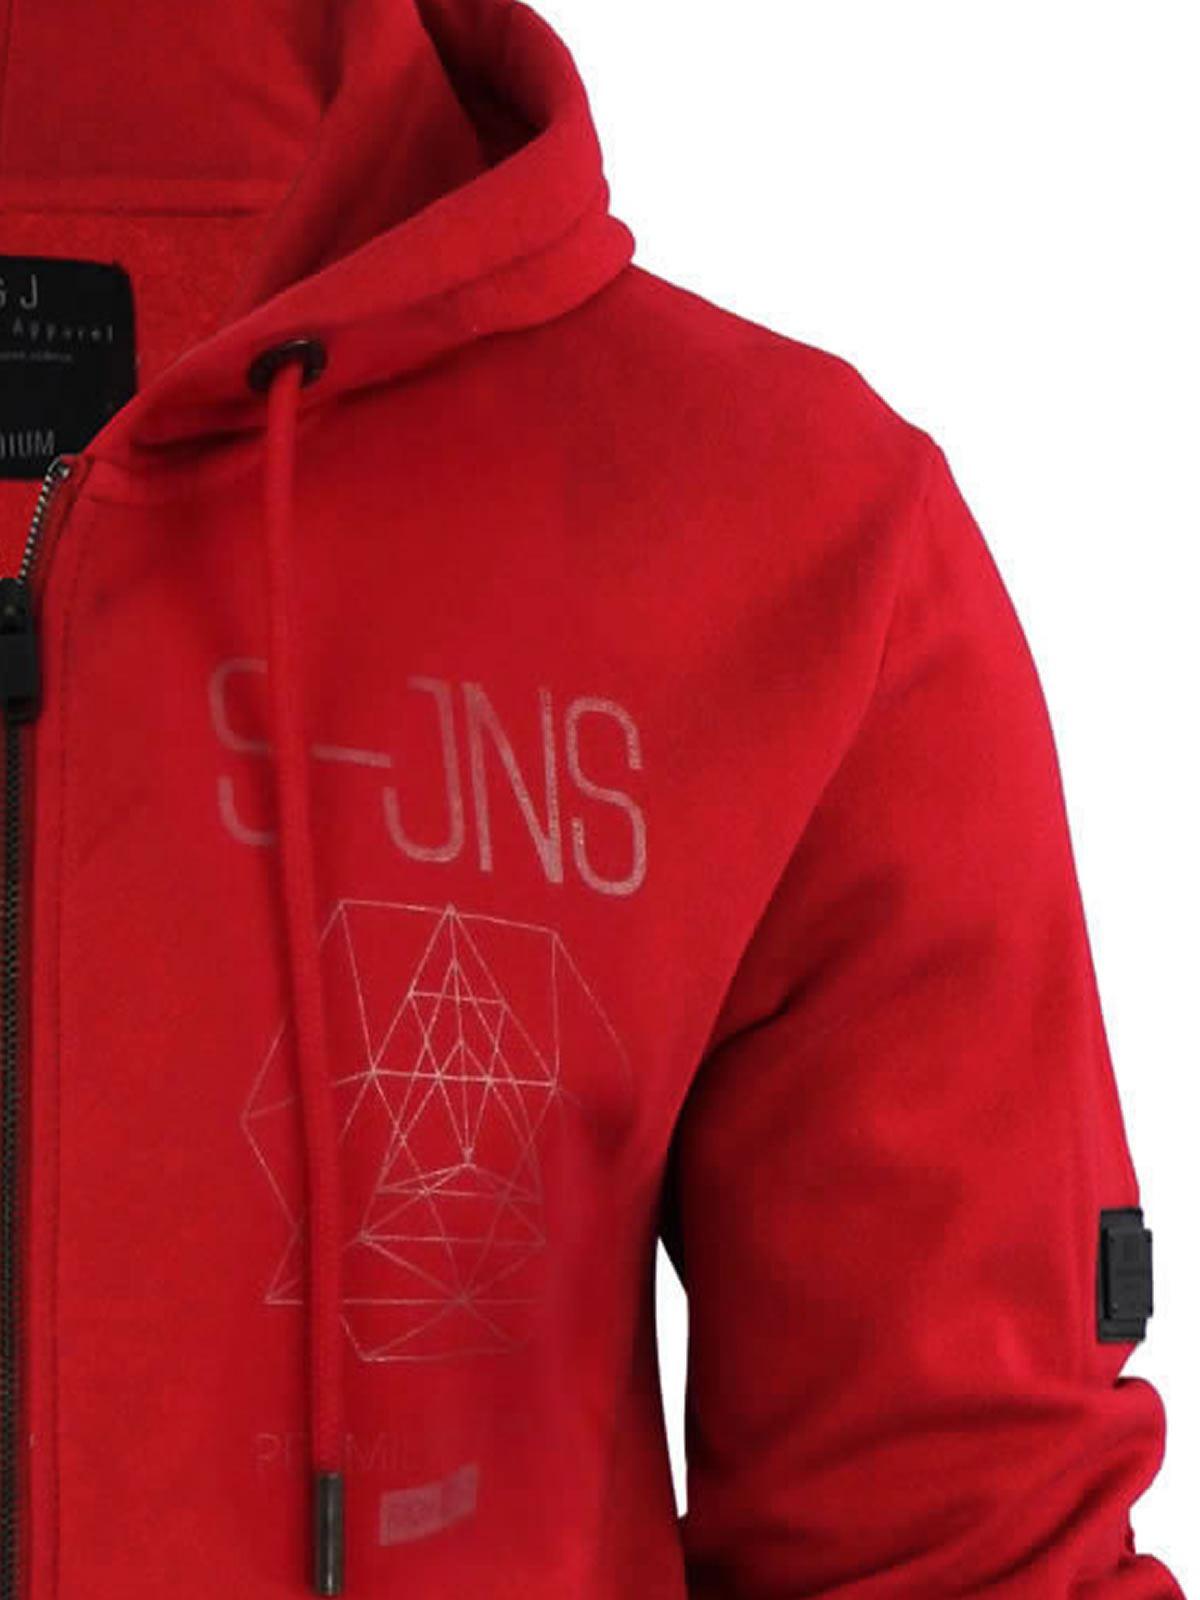 Mens-Hoodie-Smith-amp-Jones-Zip-Up-Hooded-Sweater-Jumper thumbnail 10